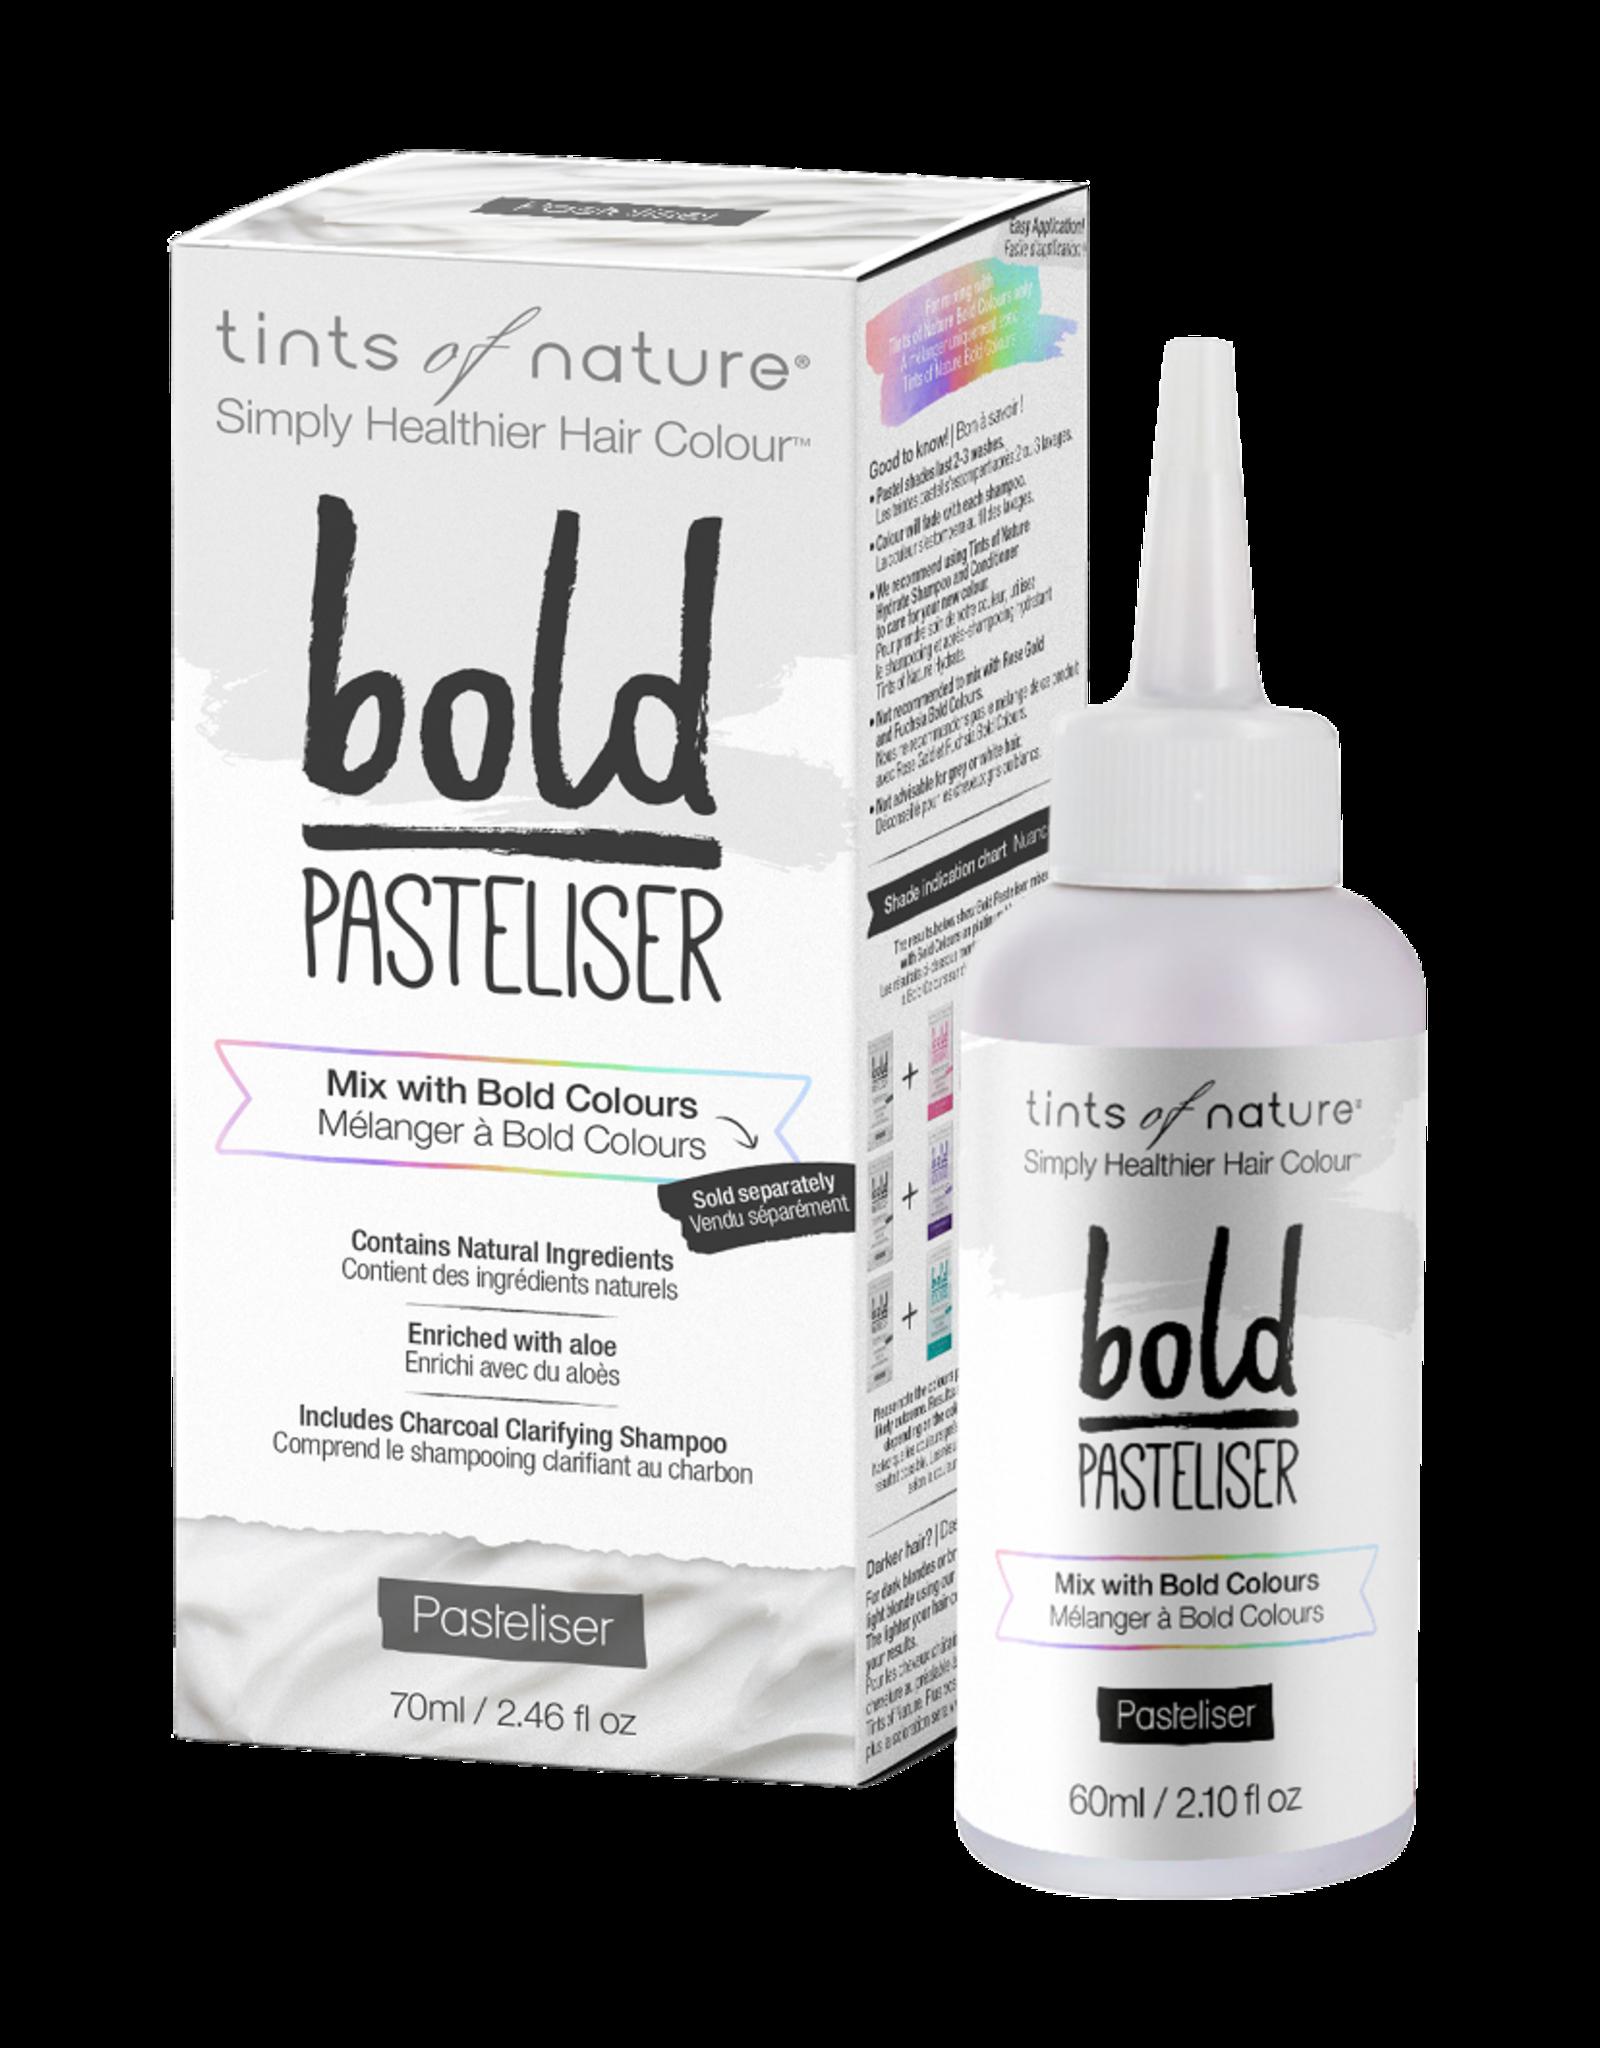 tints of nature Bold Pasteliser 70ml